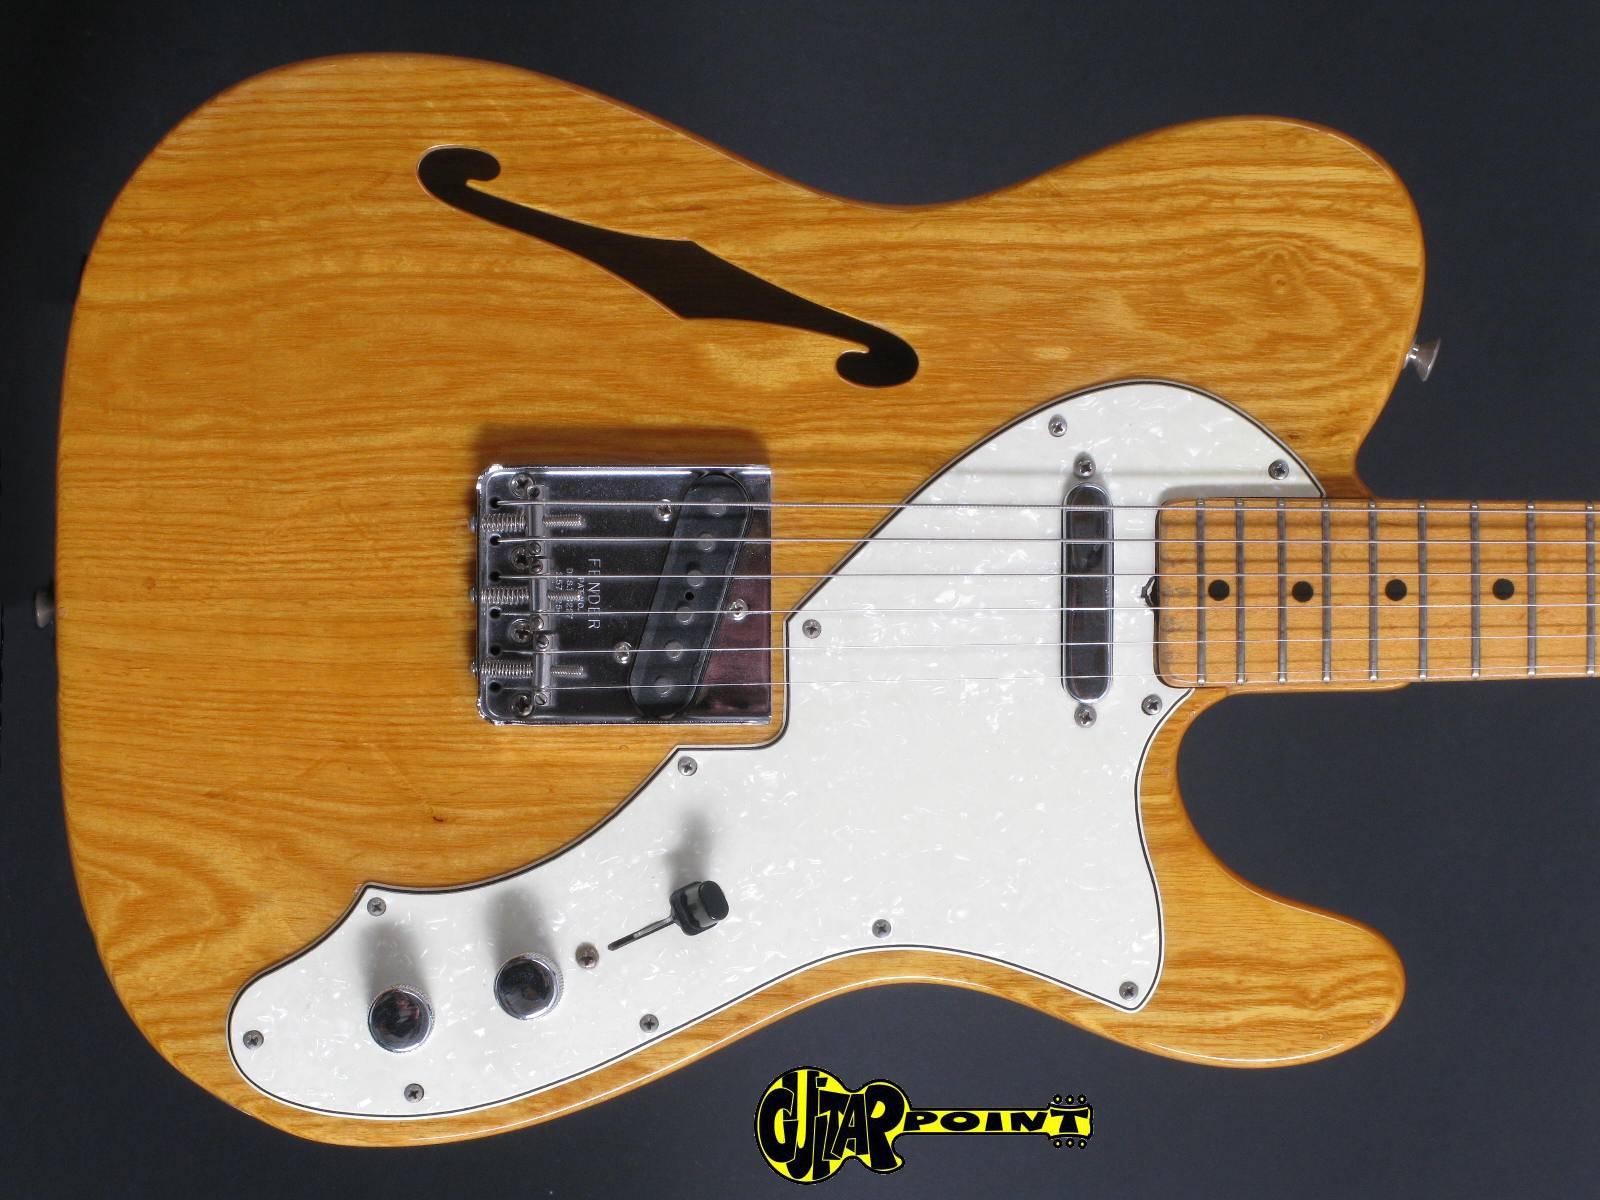 1968 Fender Thinline Telecaster - Natural